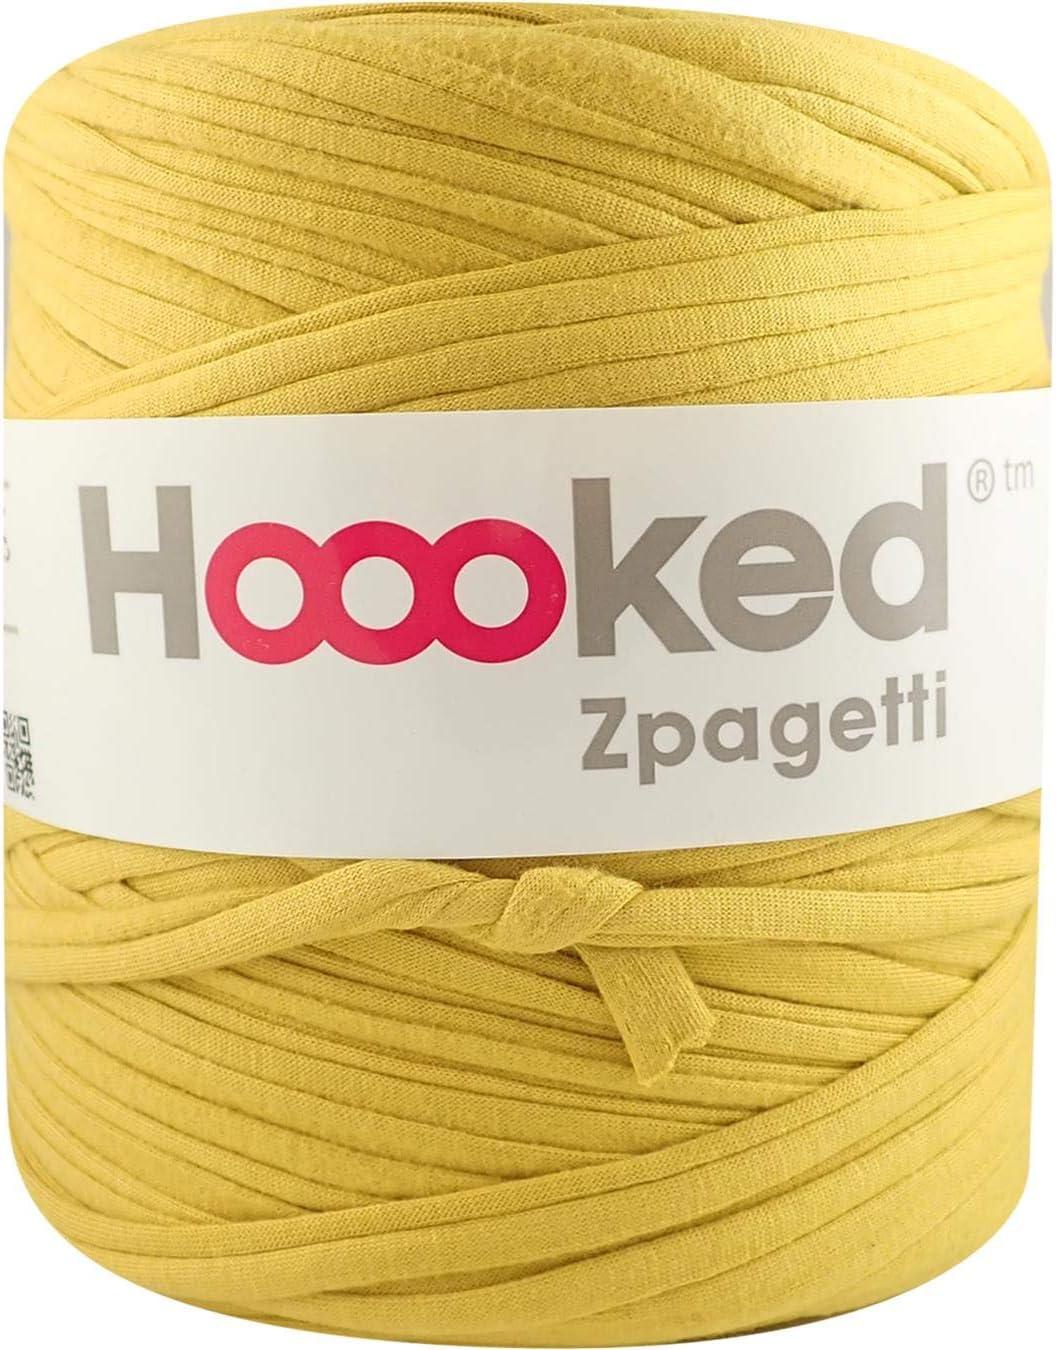 Hoooked Zpagetti Recycled T-shirt Yarn 120m Yellow Shade Crochet Knitting